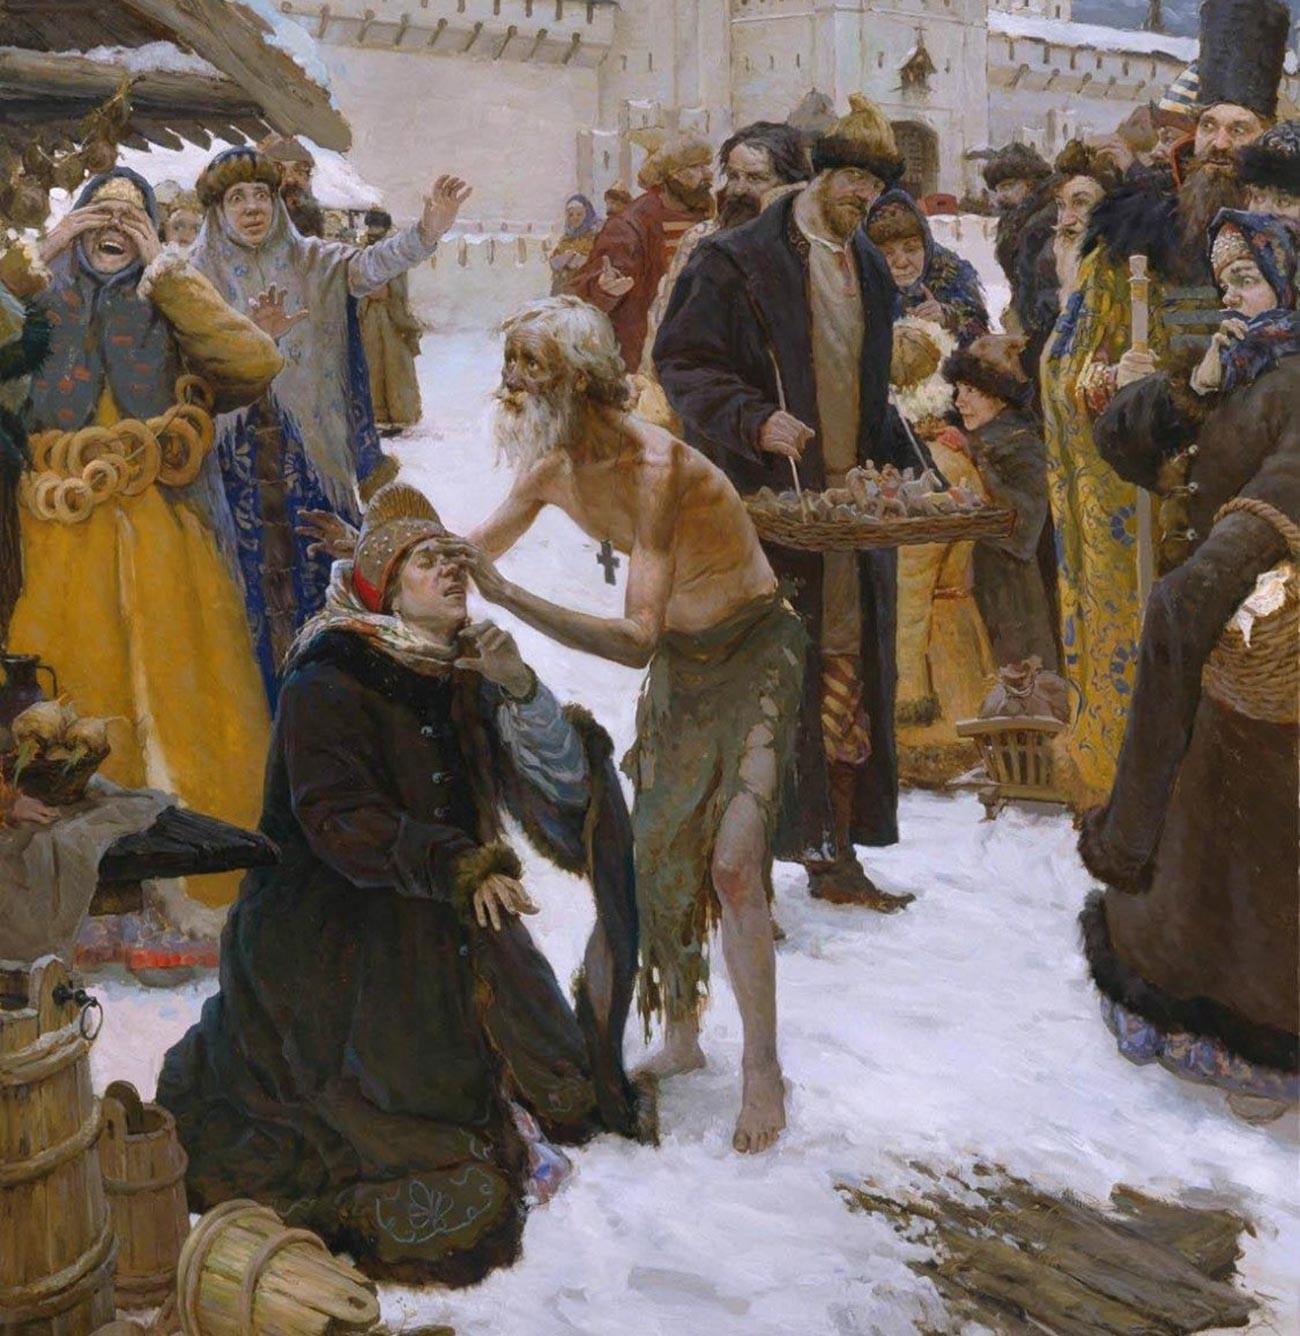 «Московский чудотворец Василий Блаженный», Графов Виталий Юрьевич, 2006.